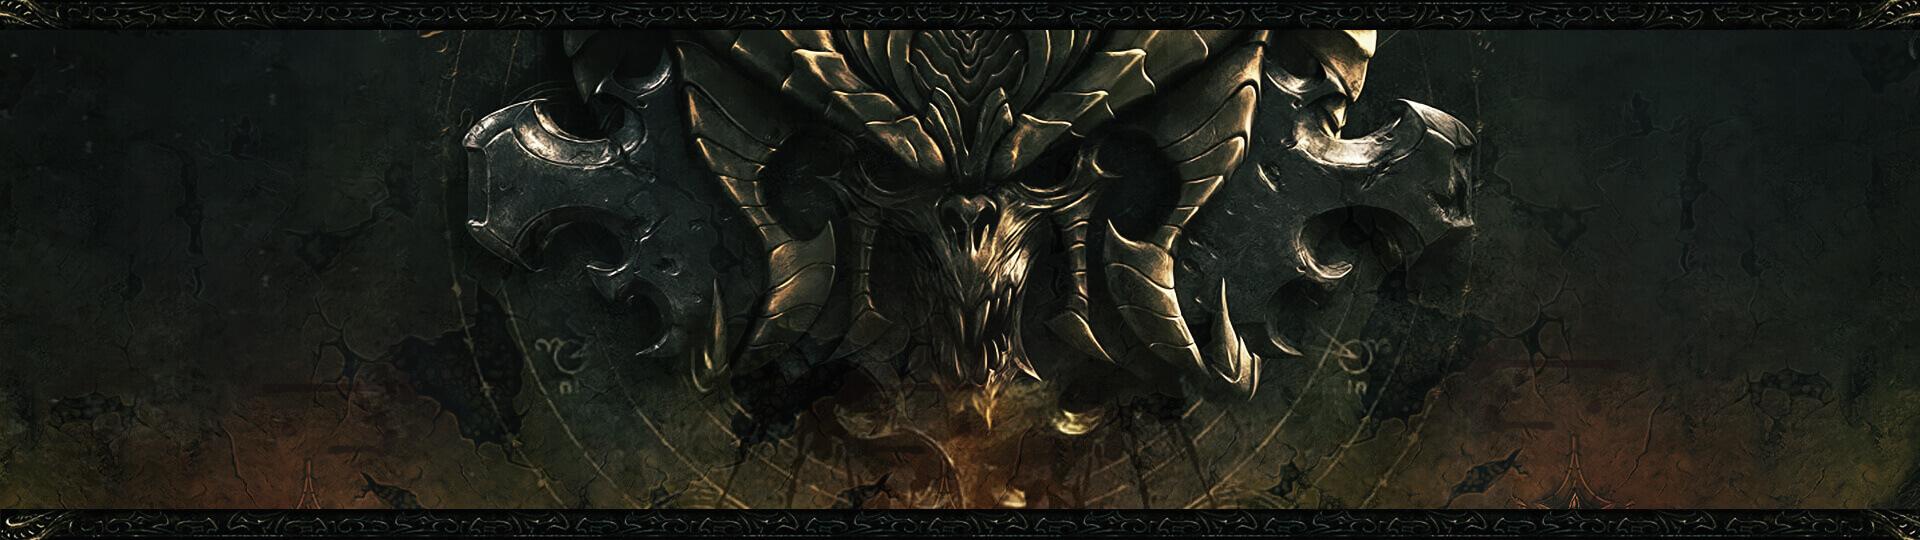 Diablo Paragon Leveling